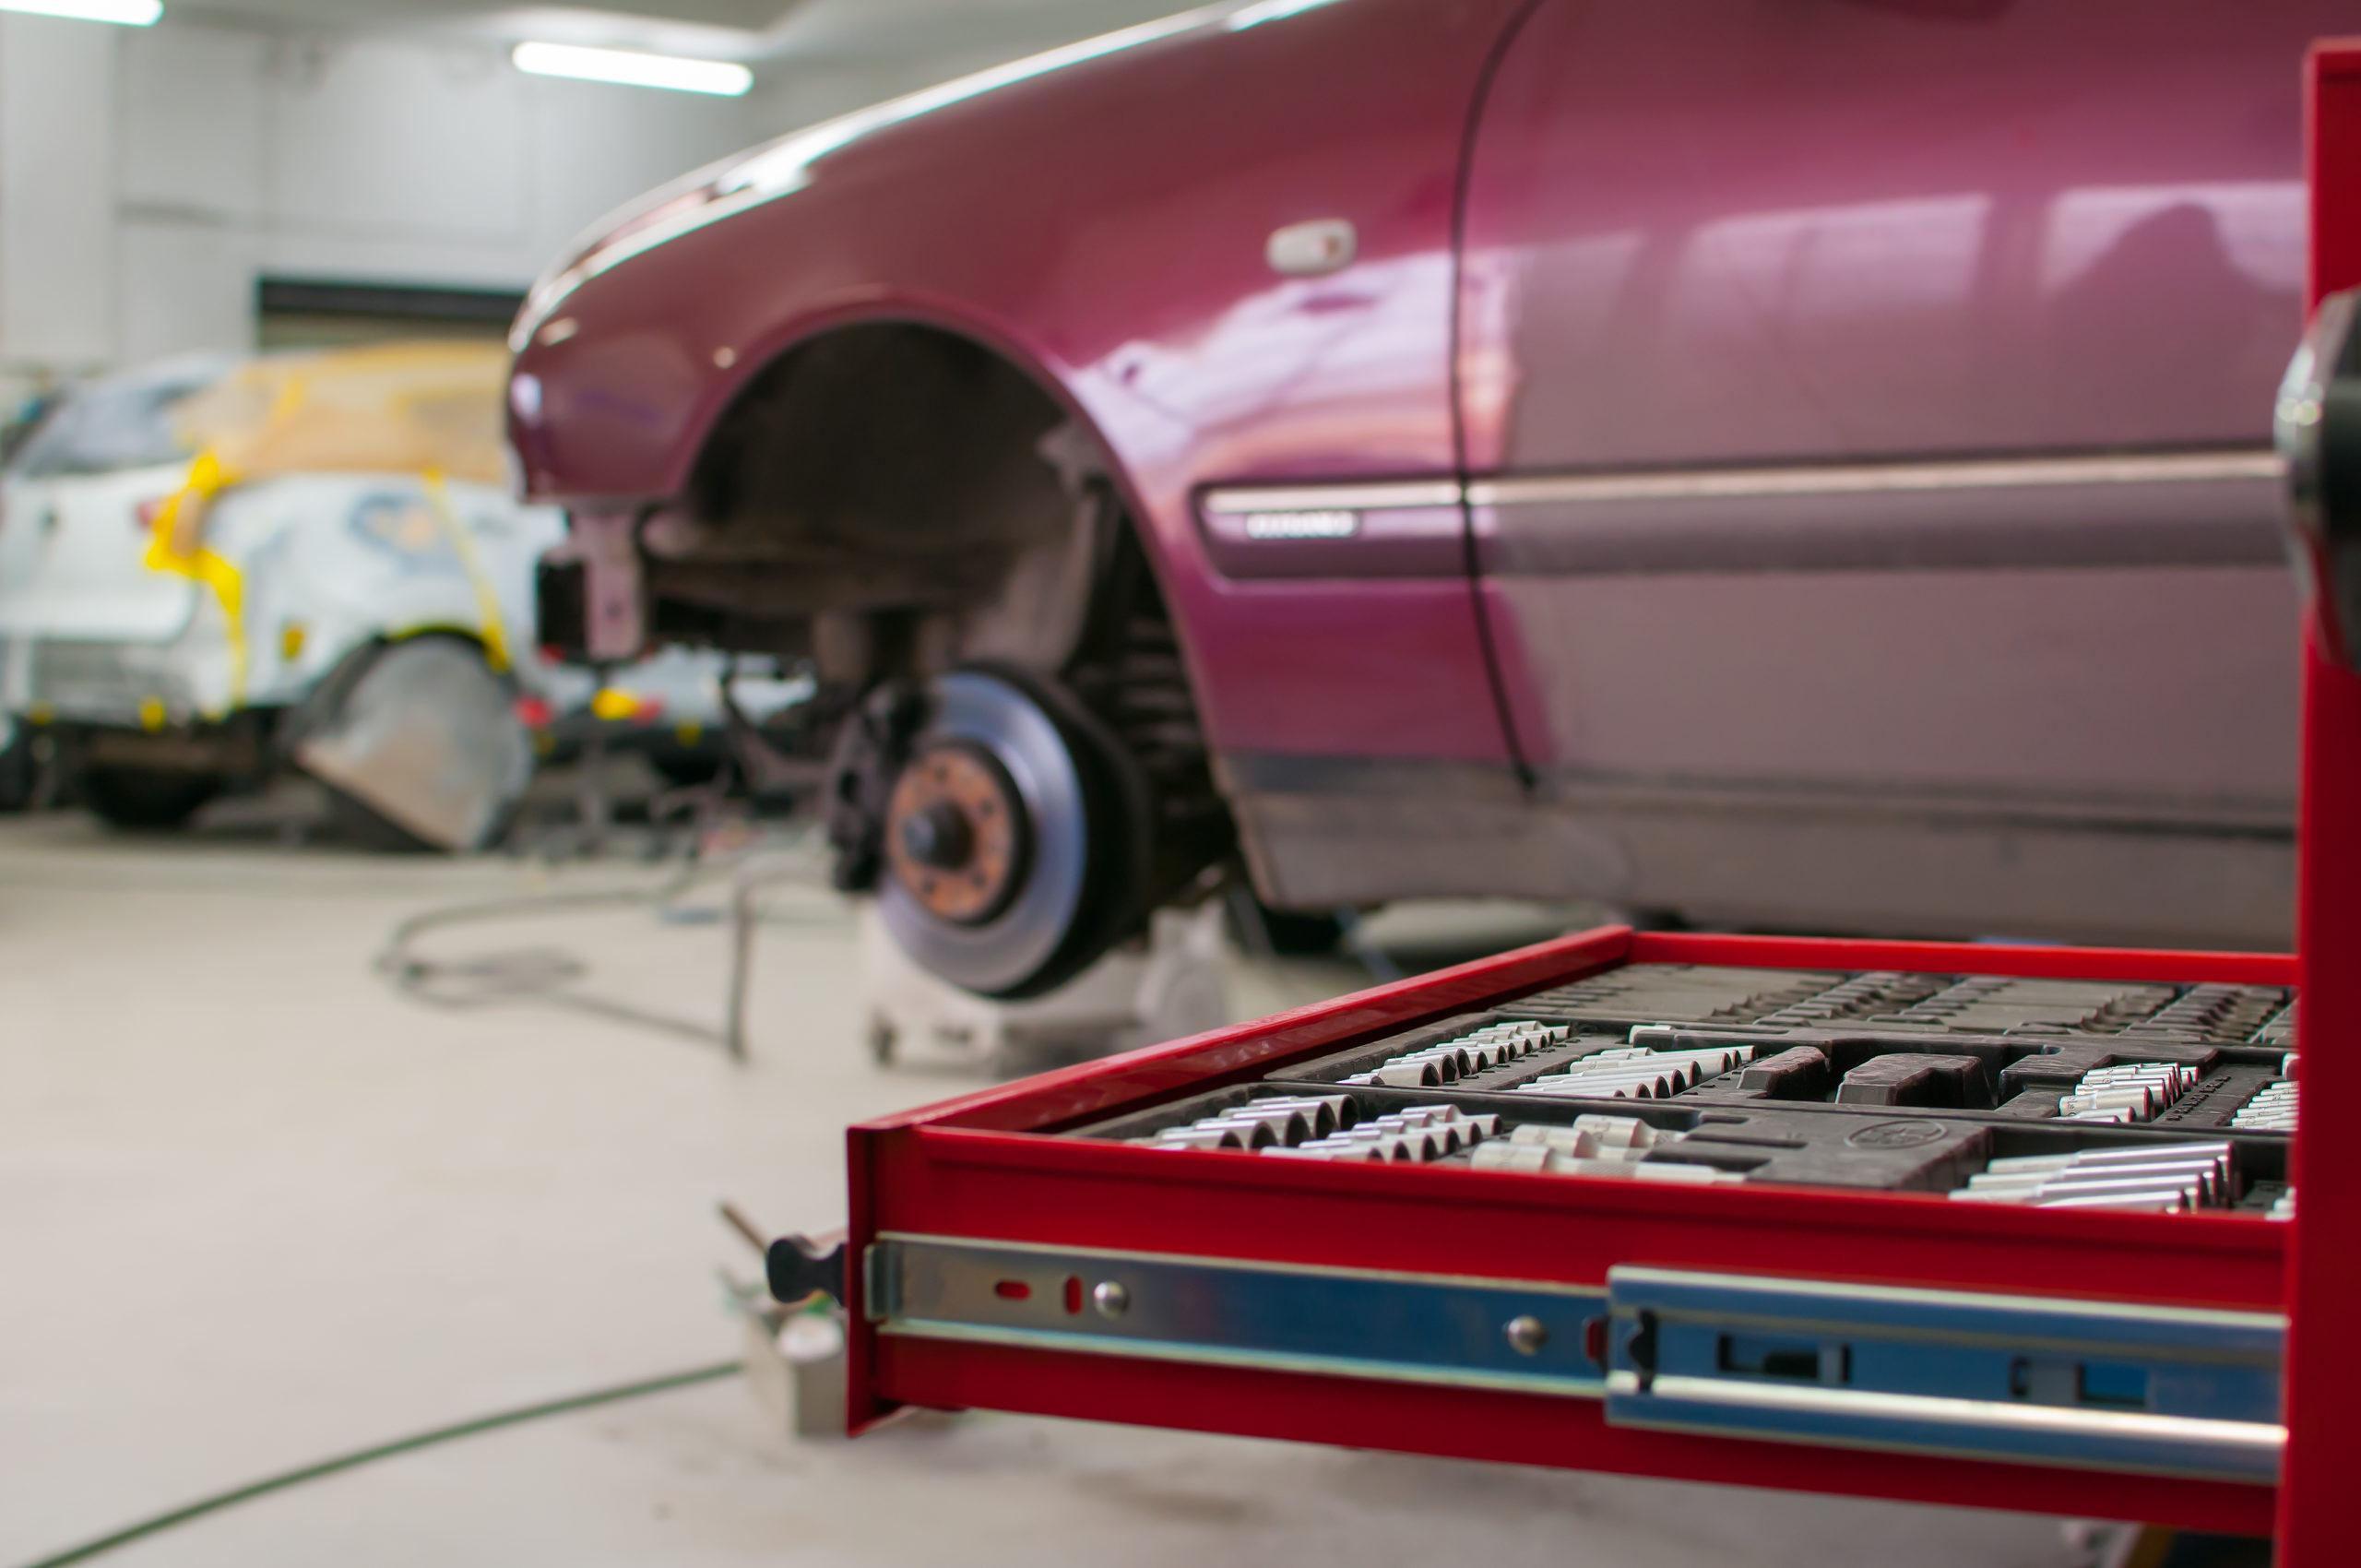 Collision repair information